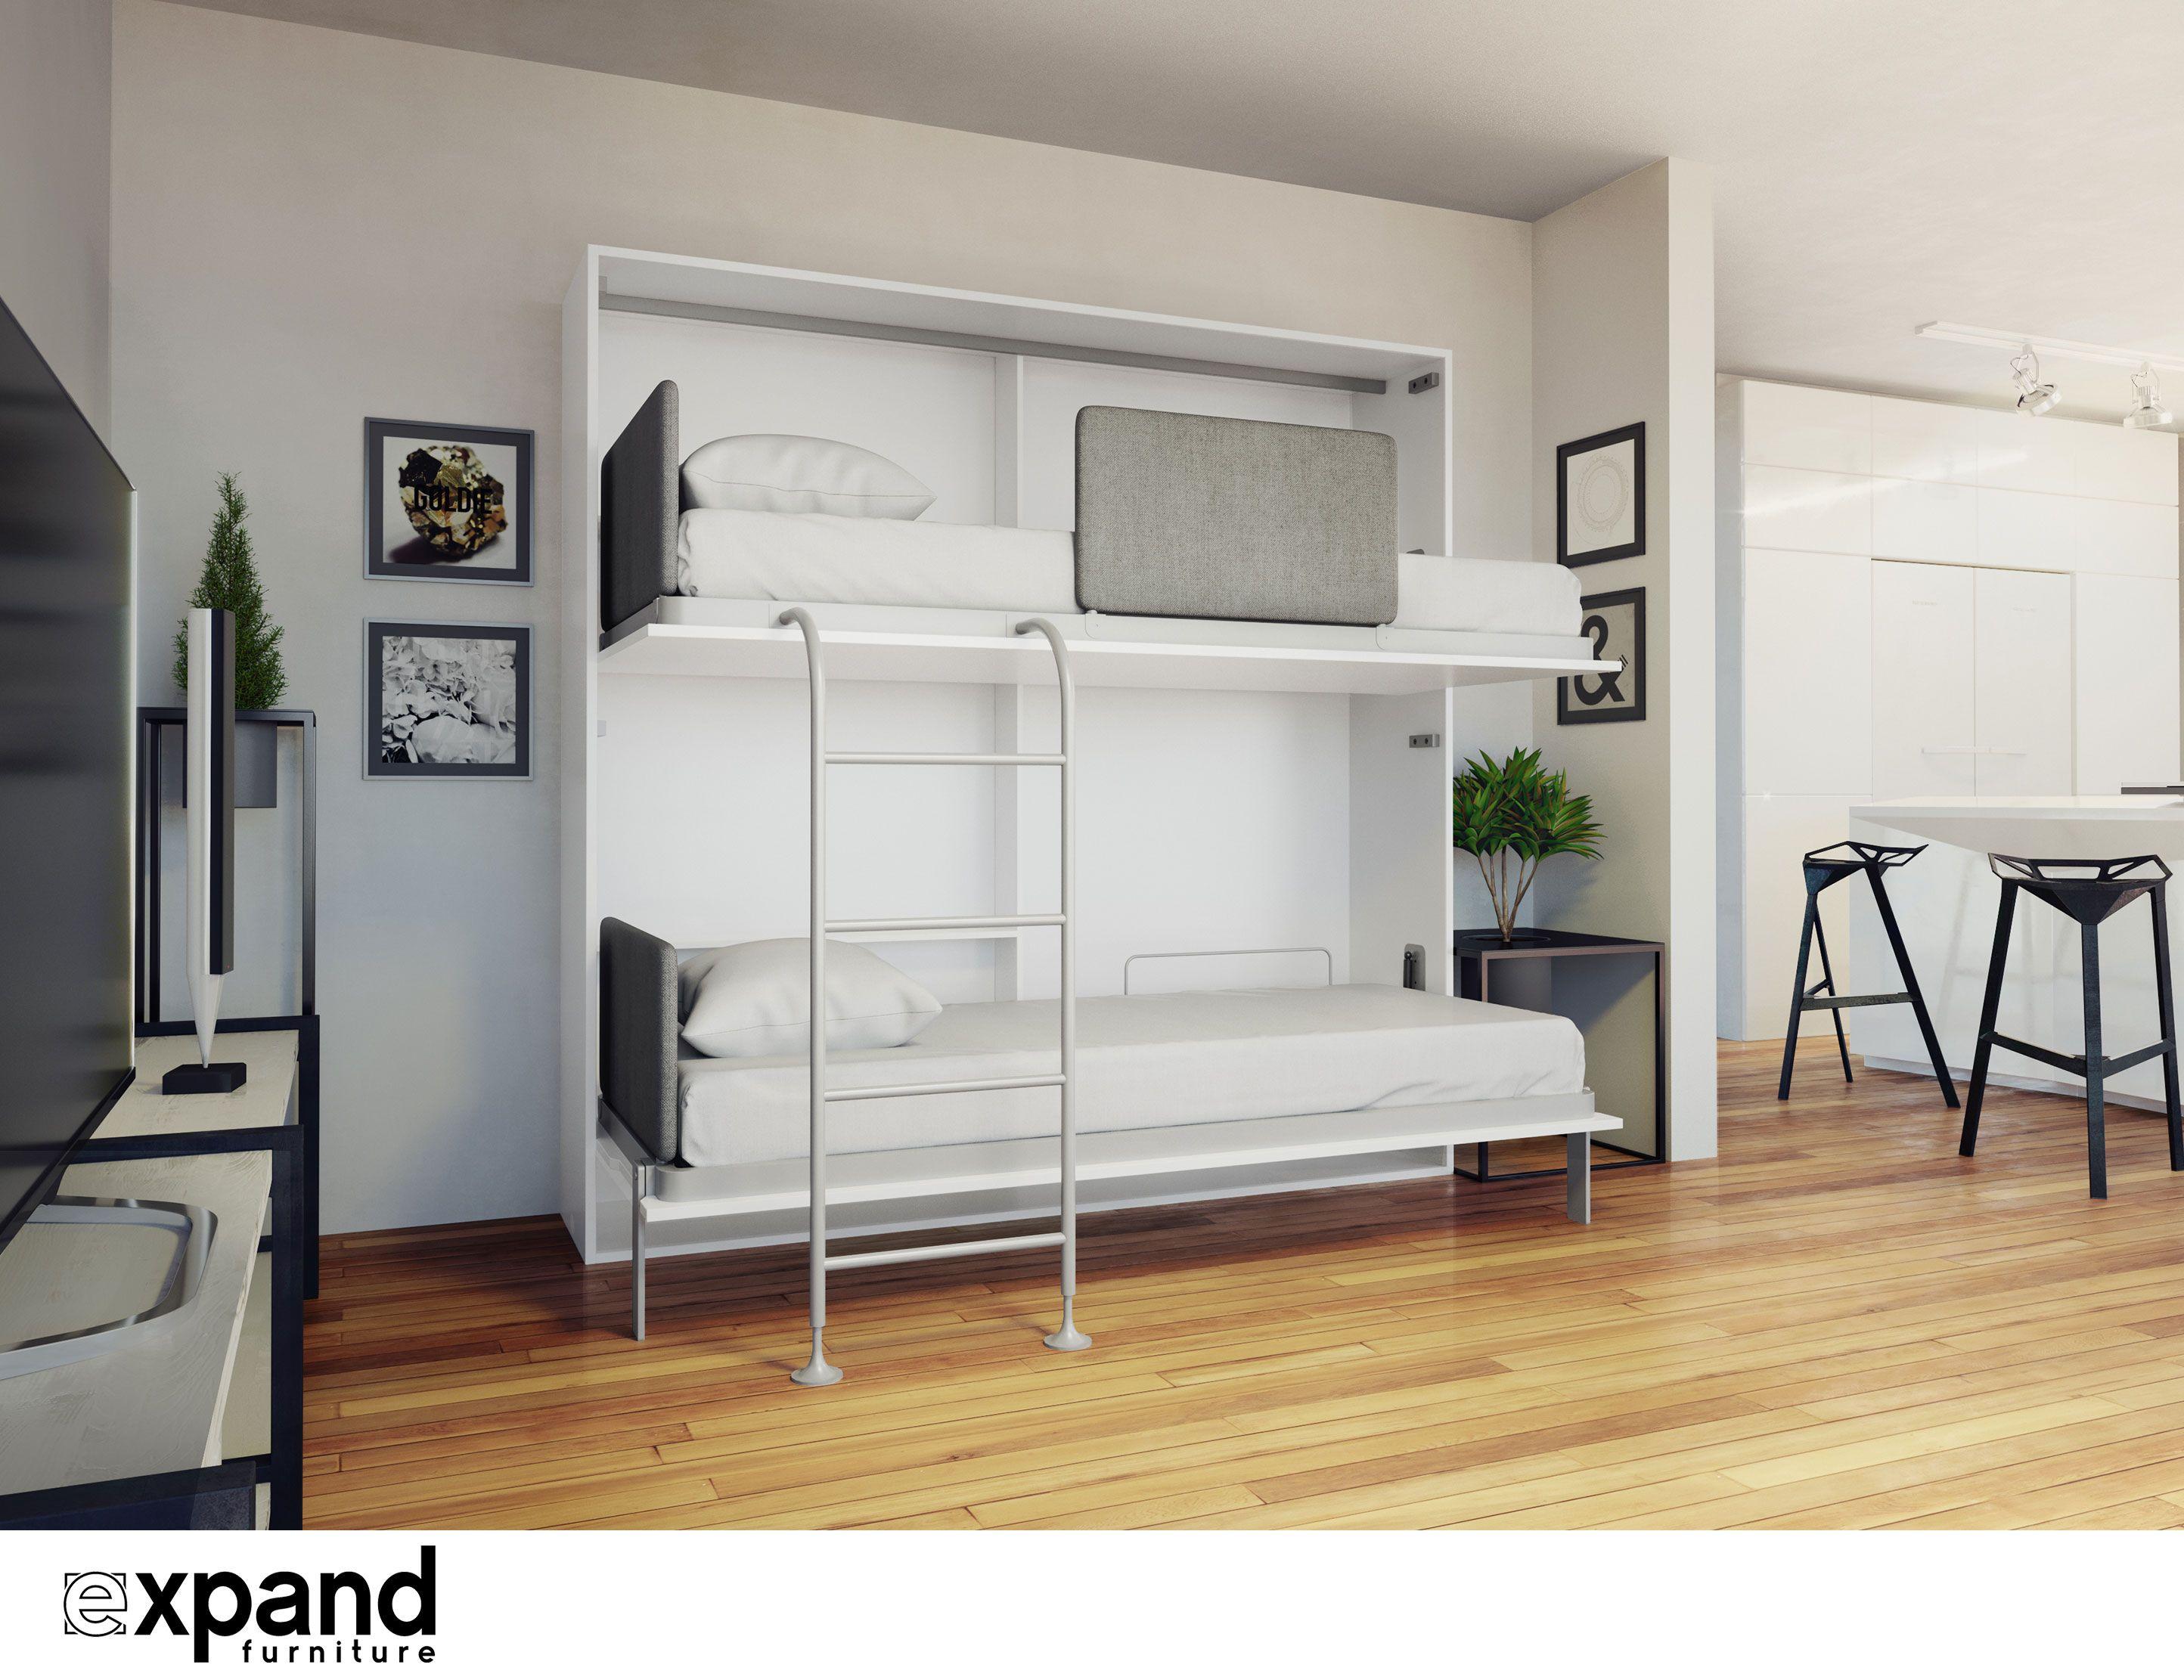 Pin By Expand Furniture On Hidden Beds Custom Bunk Beds Bunk